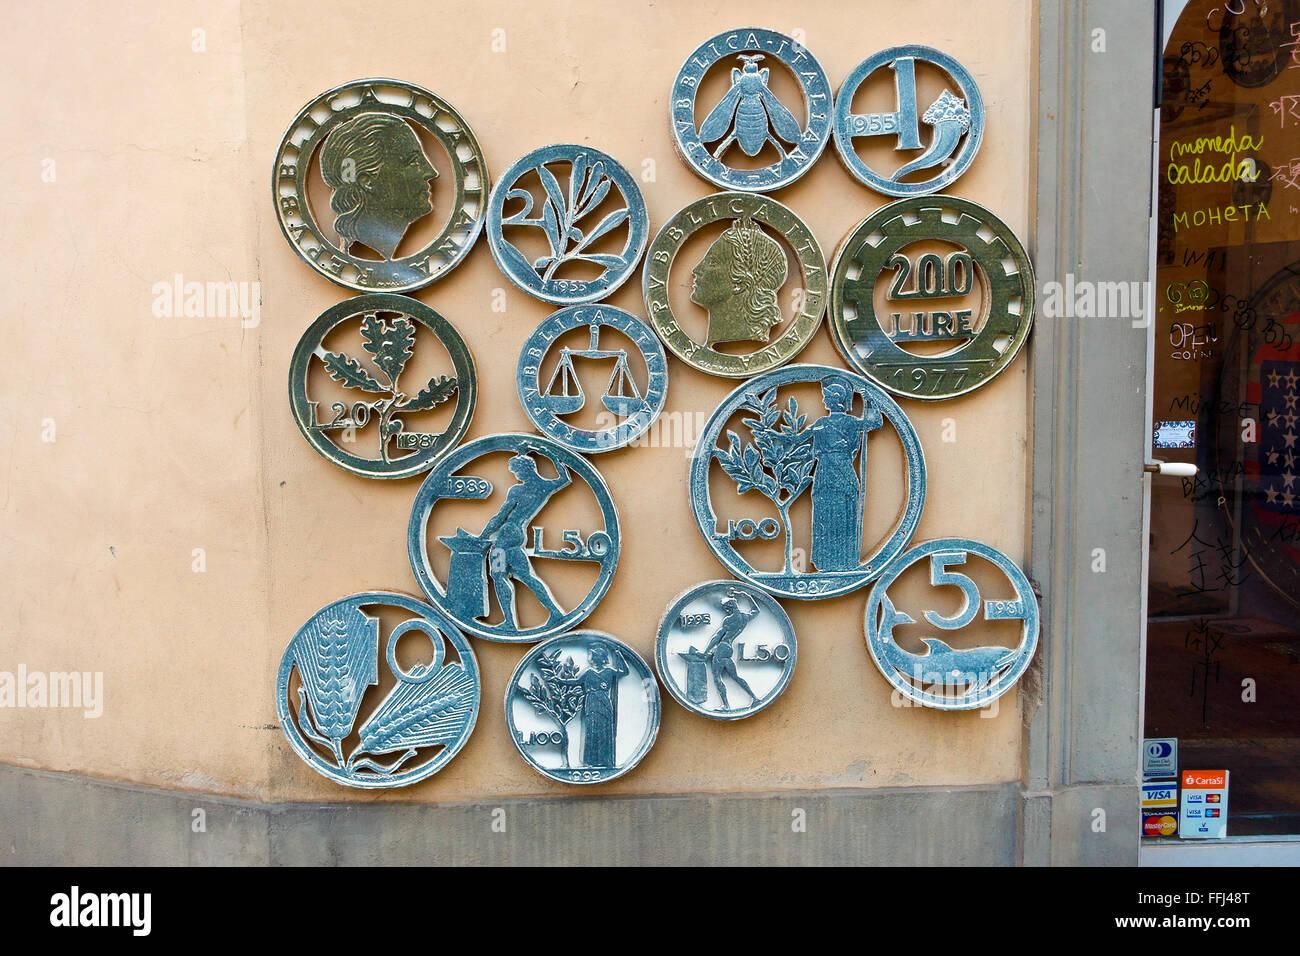 Numismatics shop sign - Stock Image